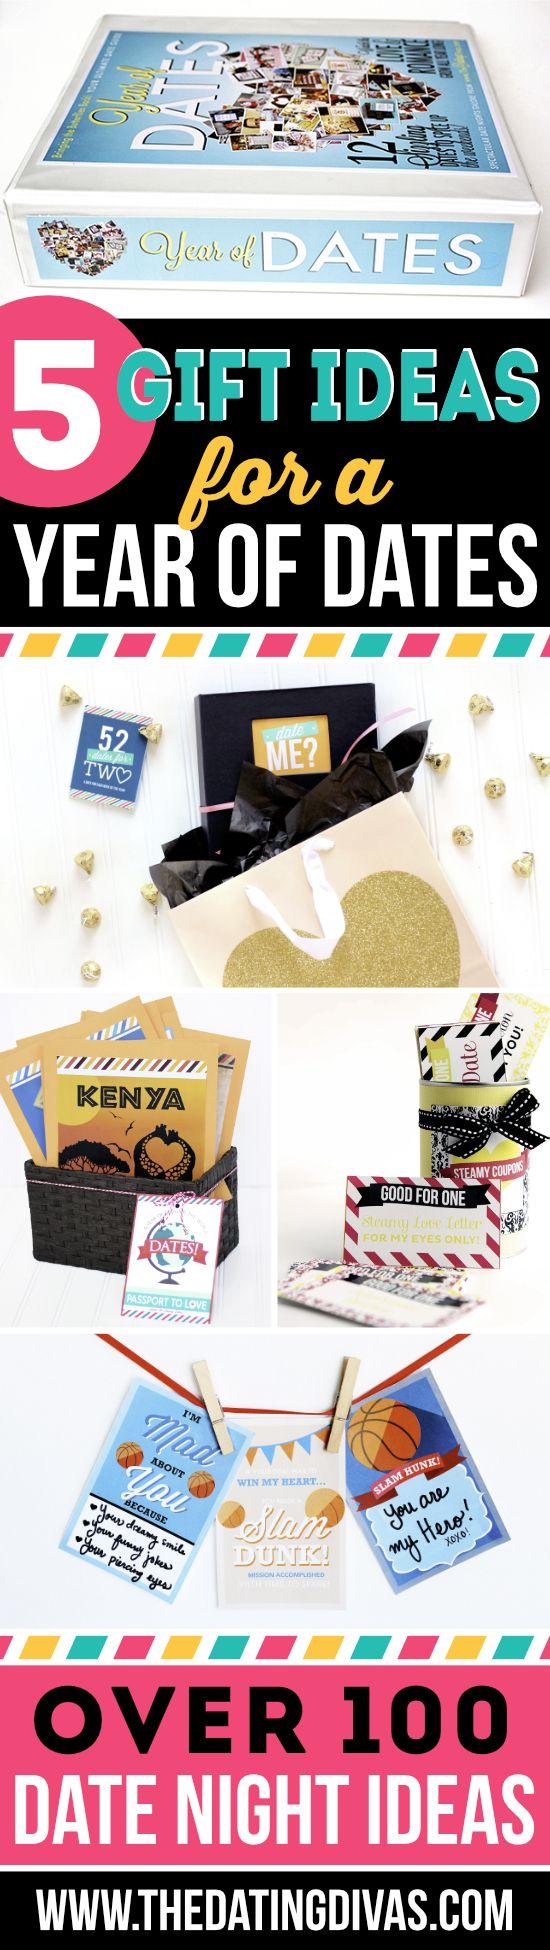 549 best romantic gift ideas for him images on pinterest. Black Bedroom Furniture Sets. Home Design Ideas